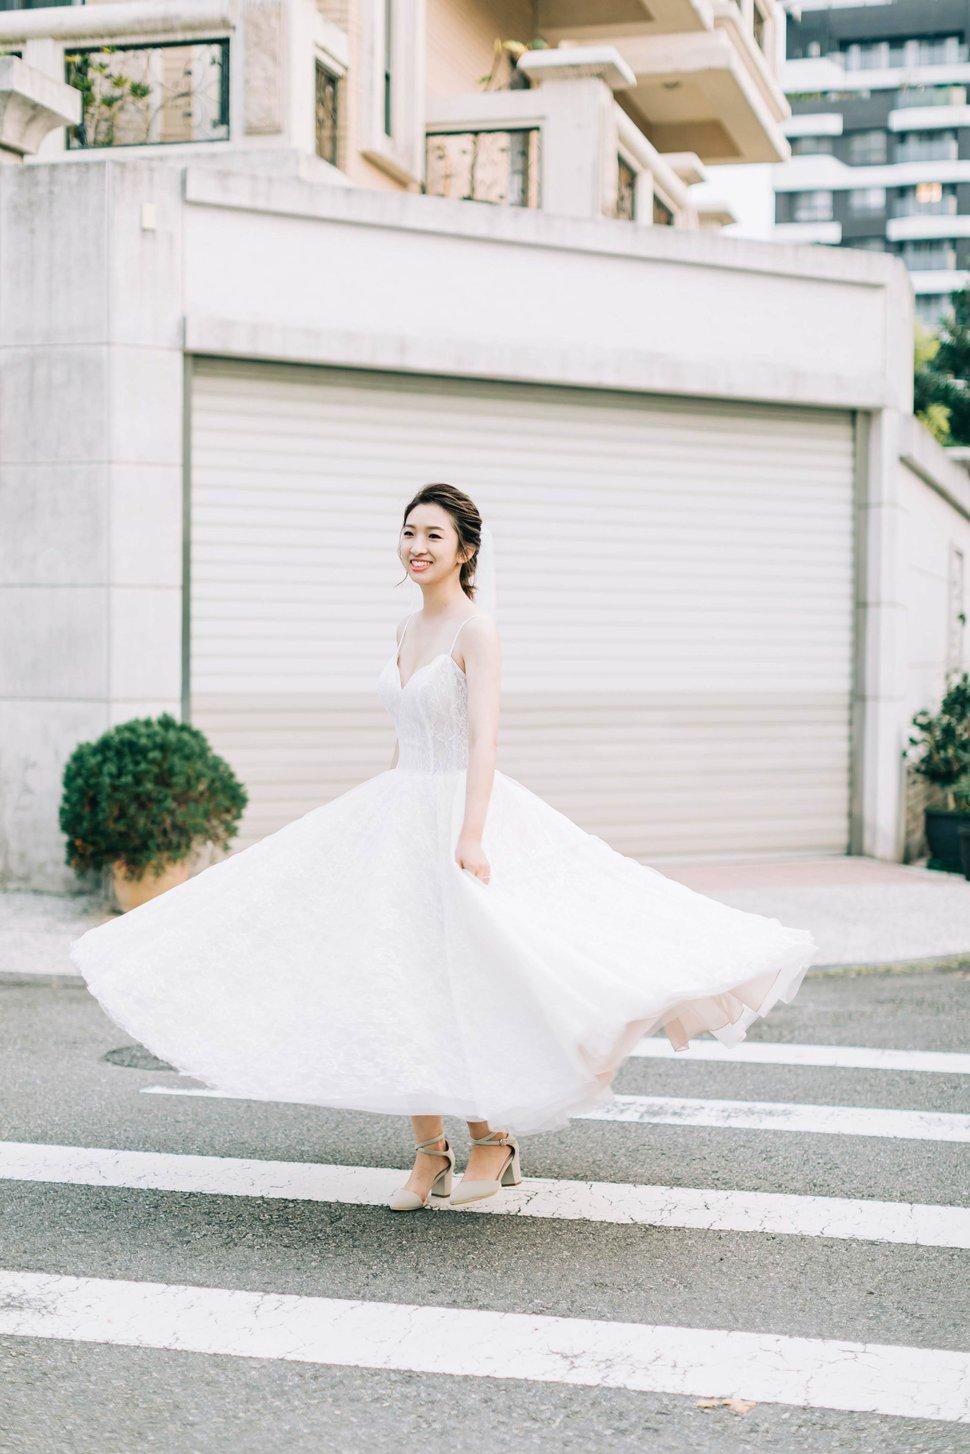 AG3_7434A - Cradle Wedding搖籃手工婚紗《結婚吧》